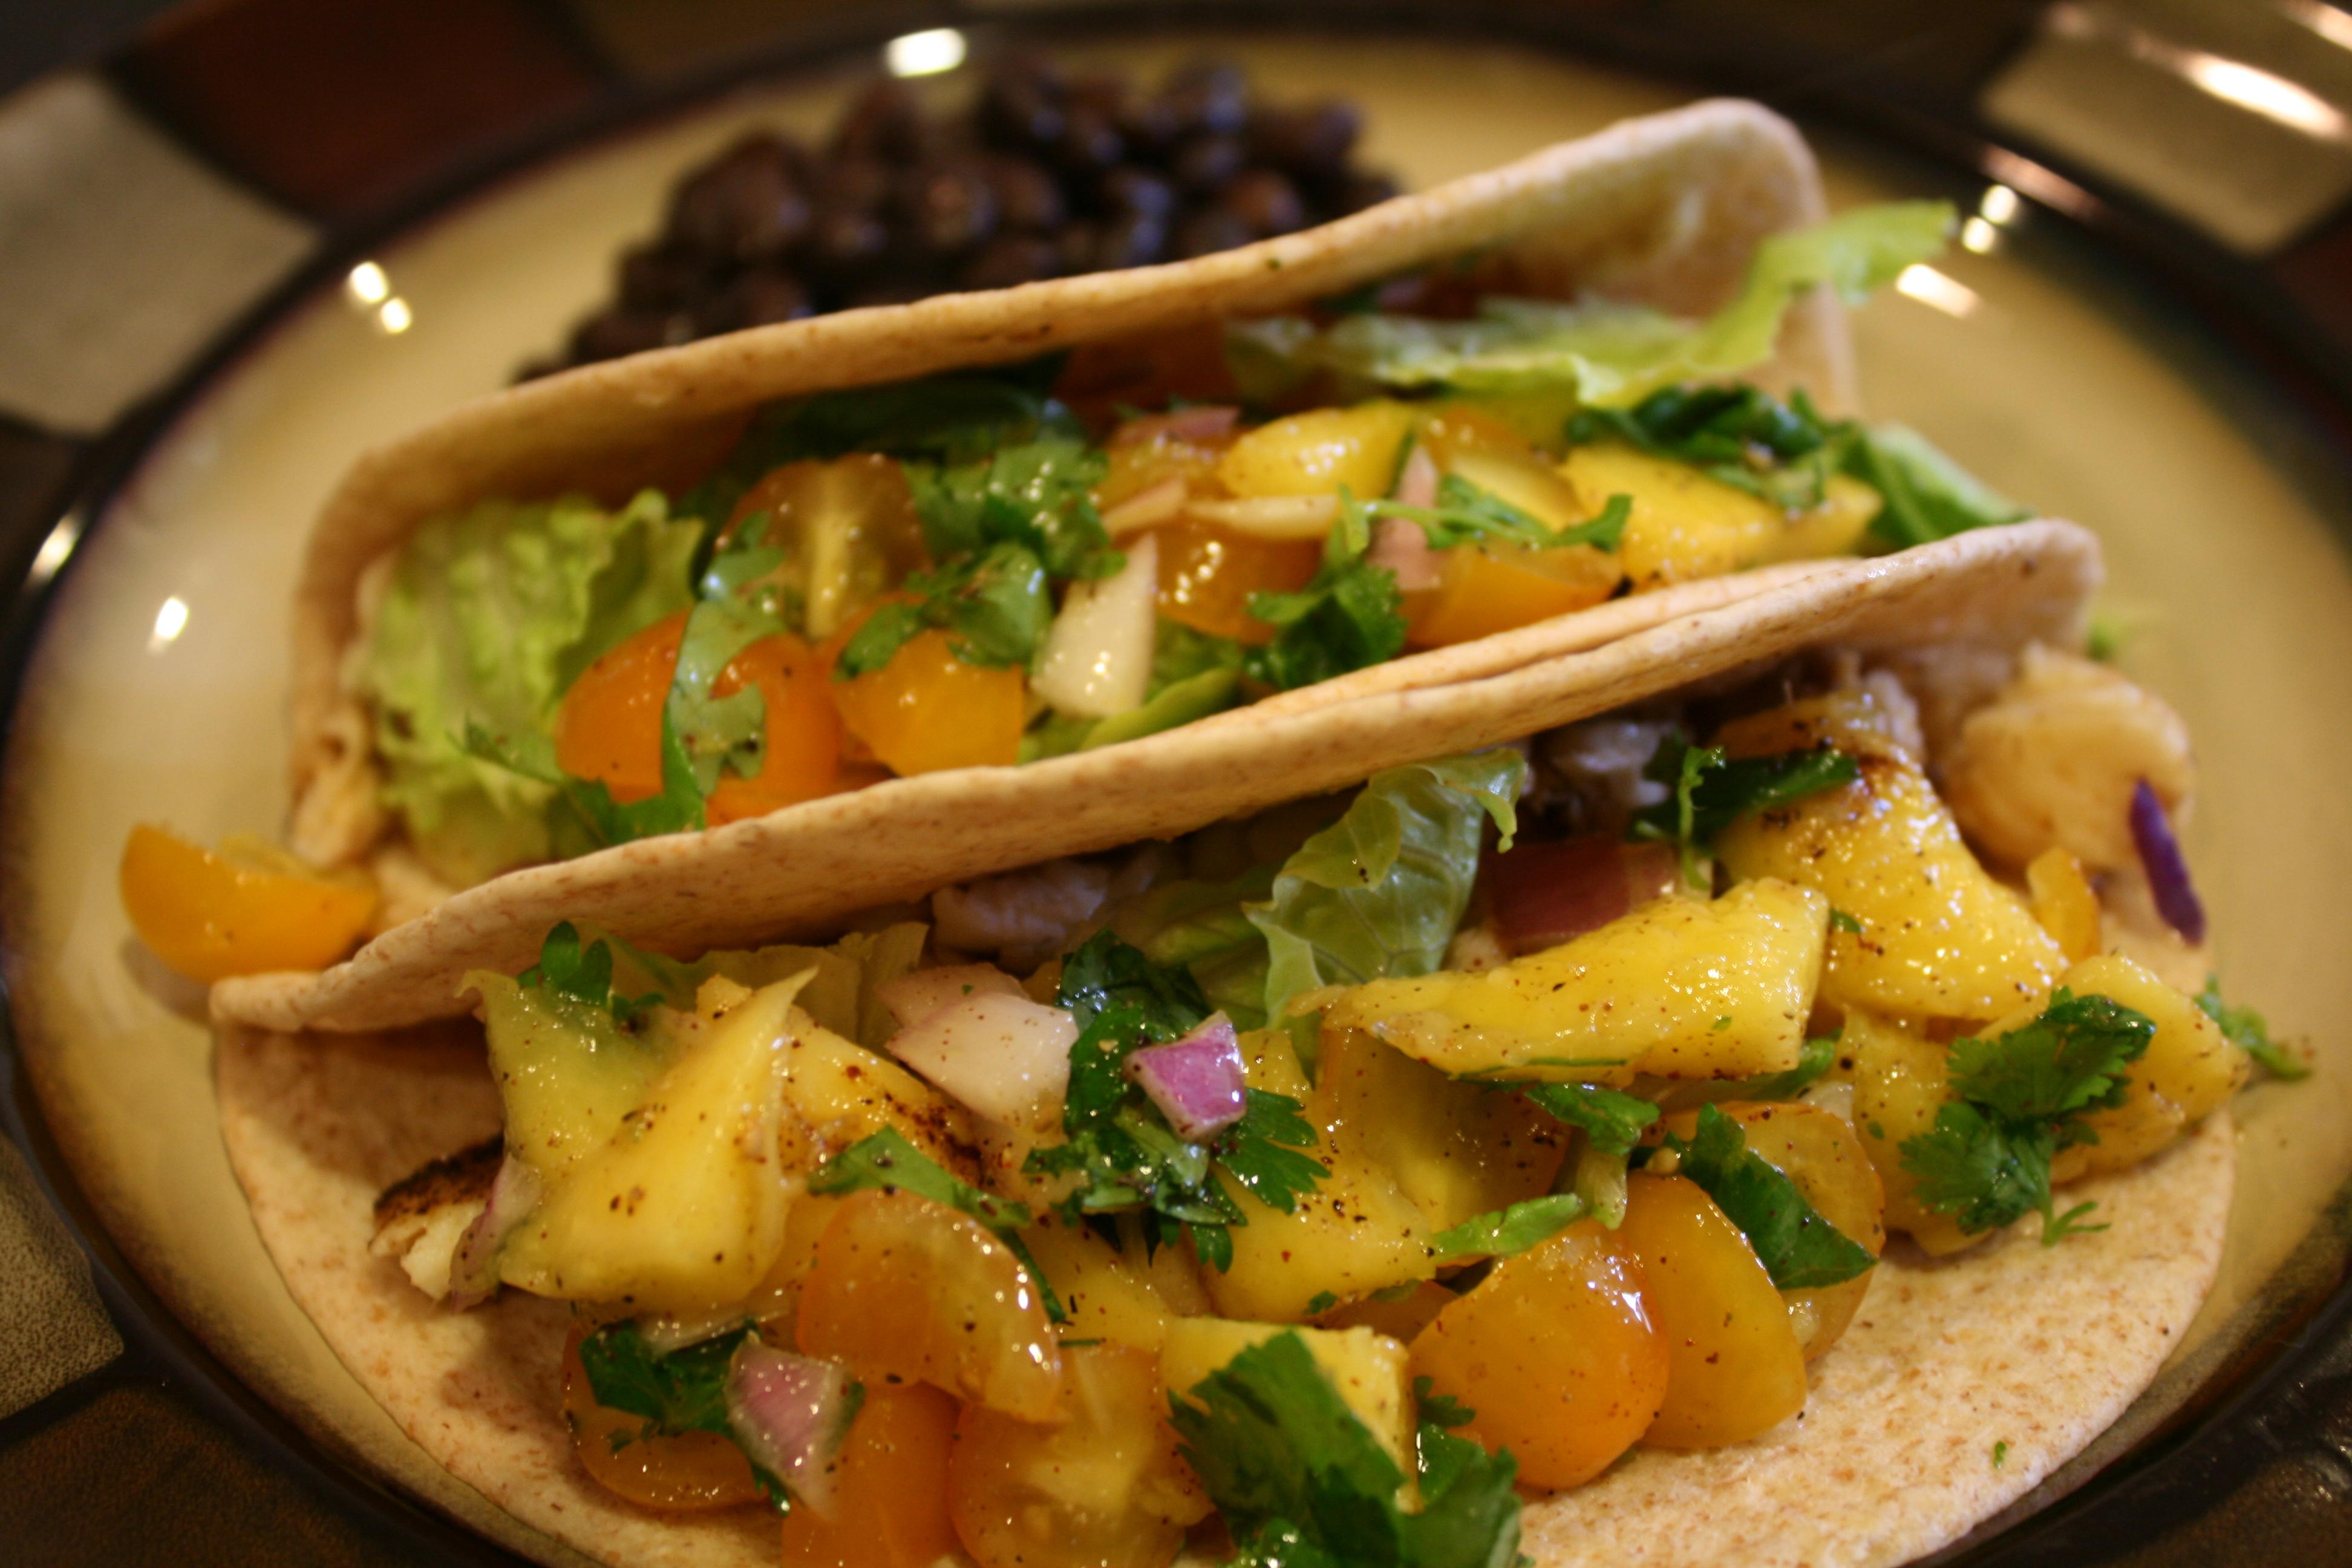 Fish tacos with mango salsa verde bigoven for Mango salsa fish